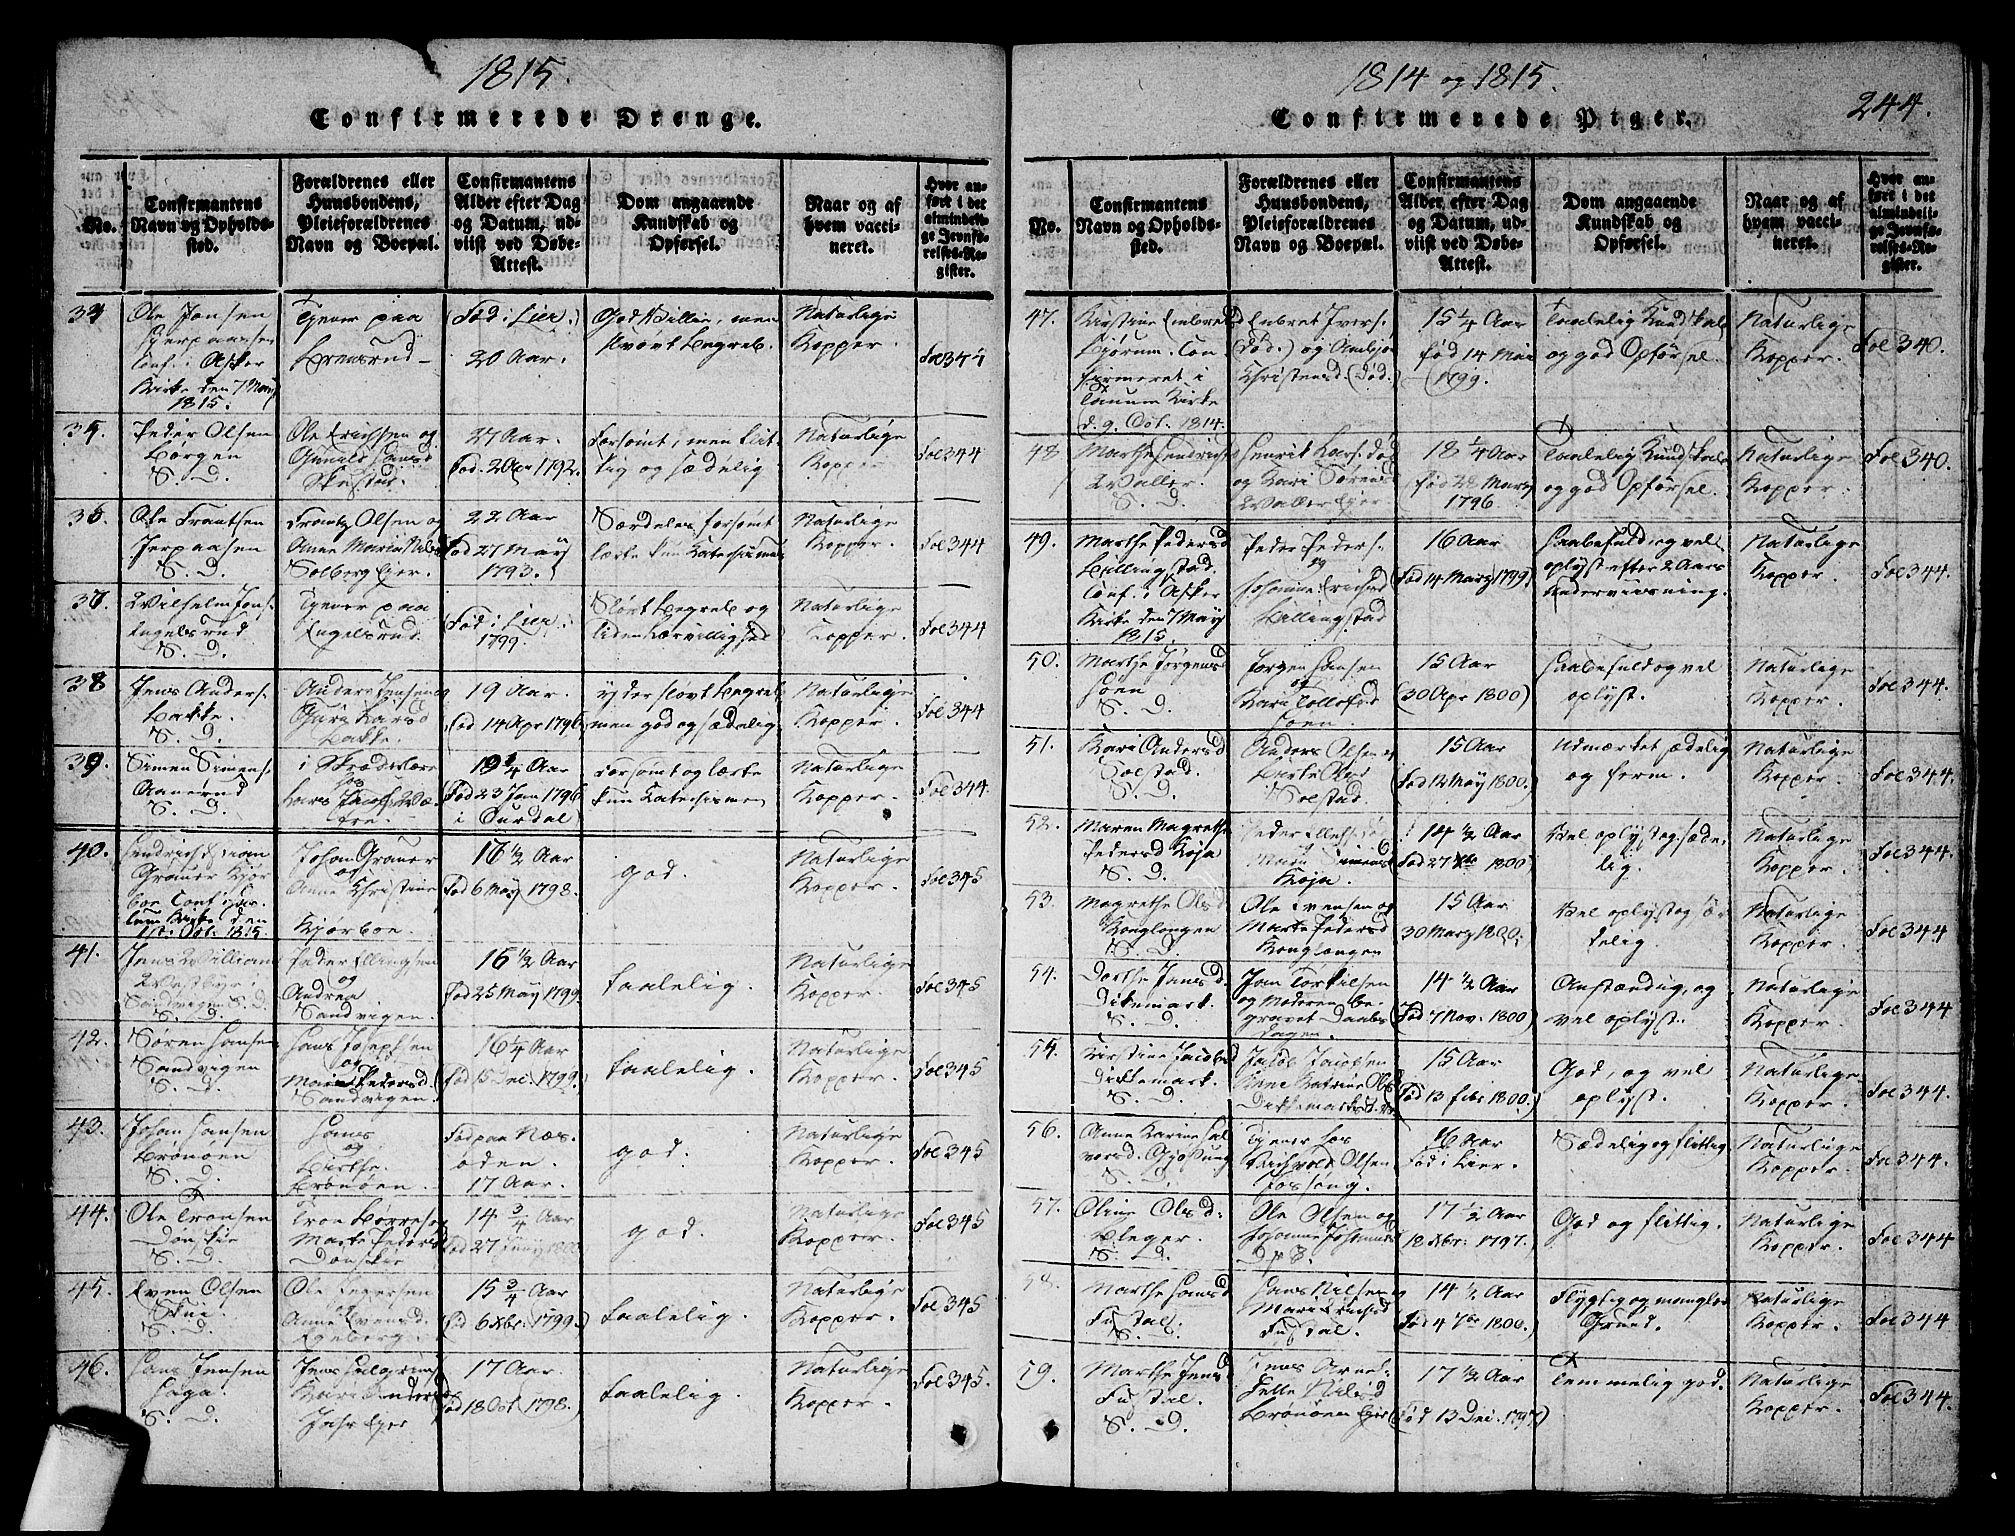 SAO, Asker prestekontor Kirkebøker, G/Ga/L0001: Klokkerbok nr. I 1, 1814-1830, s. 244